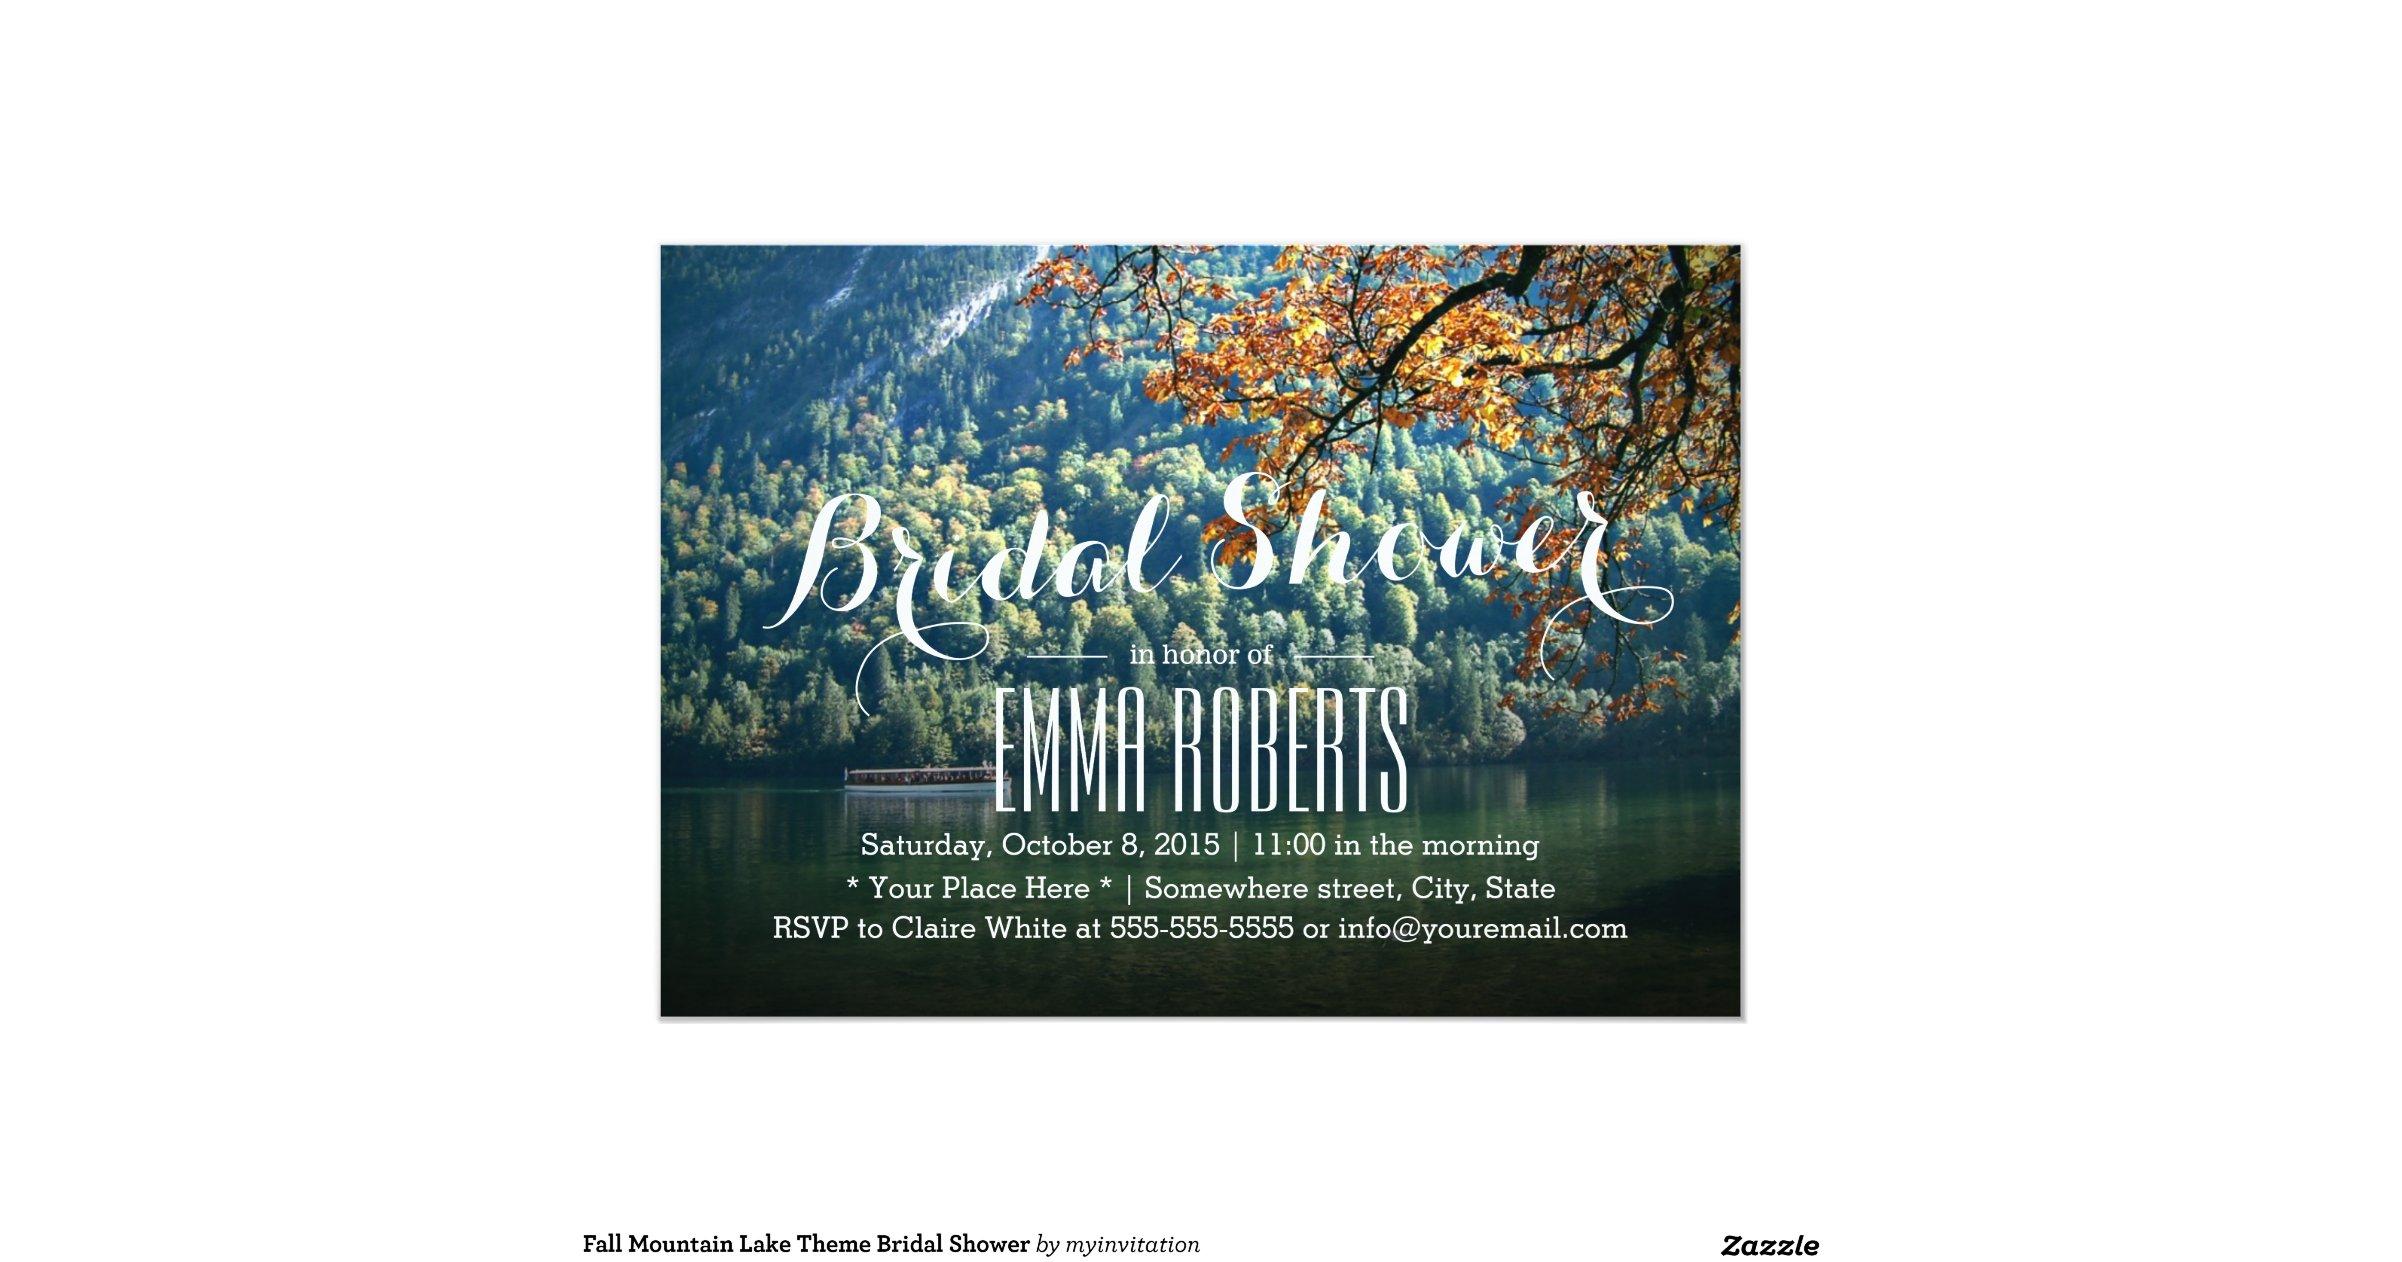 Lake Themed Wedding Invitations: Mountain_lake_theme_bridal_shower_invitations